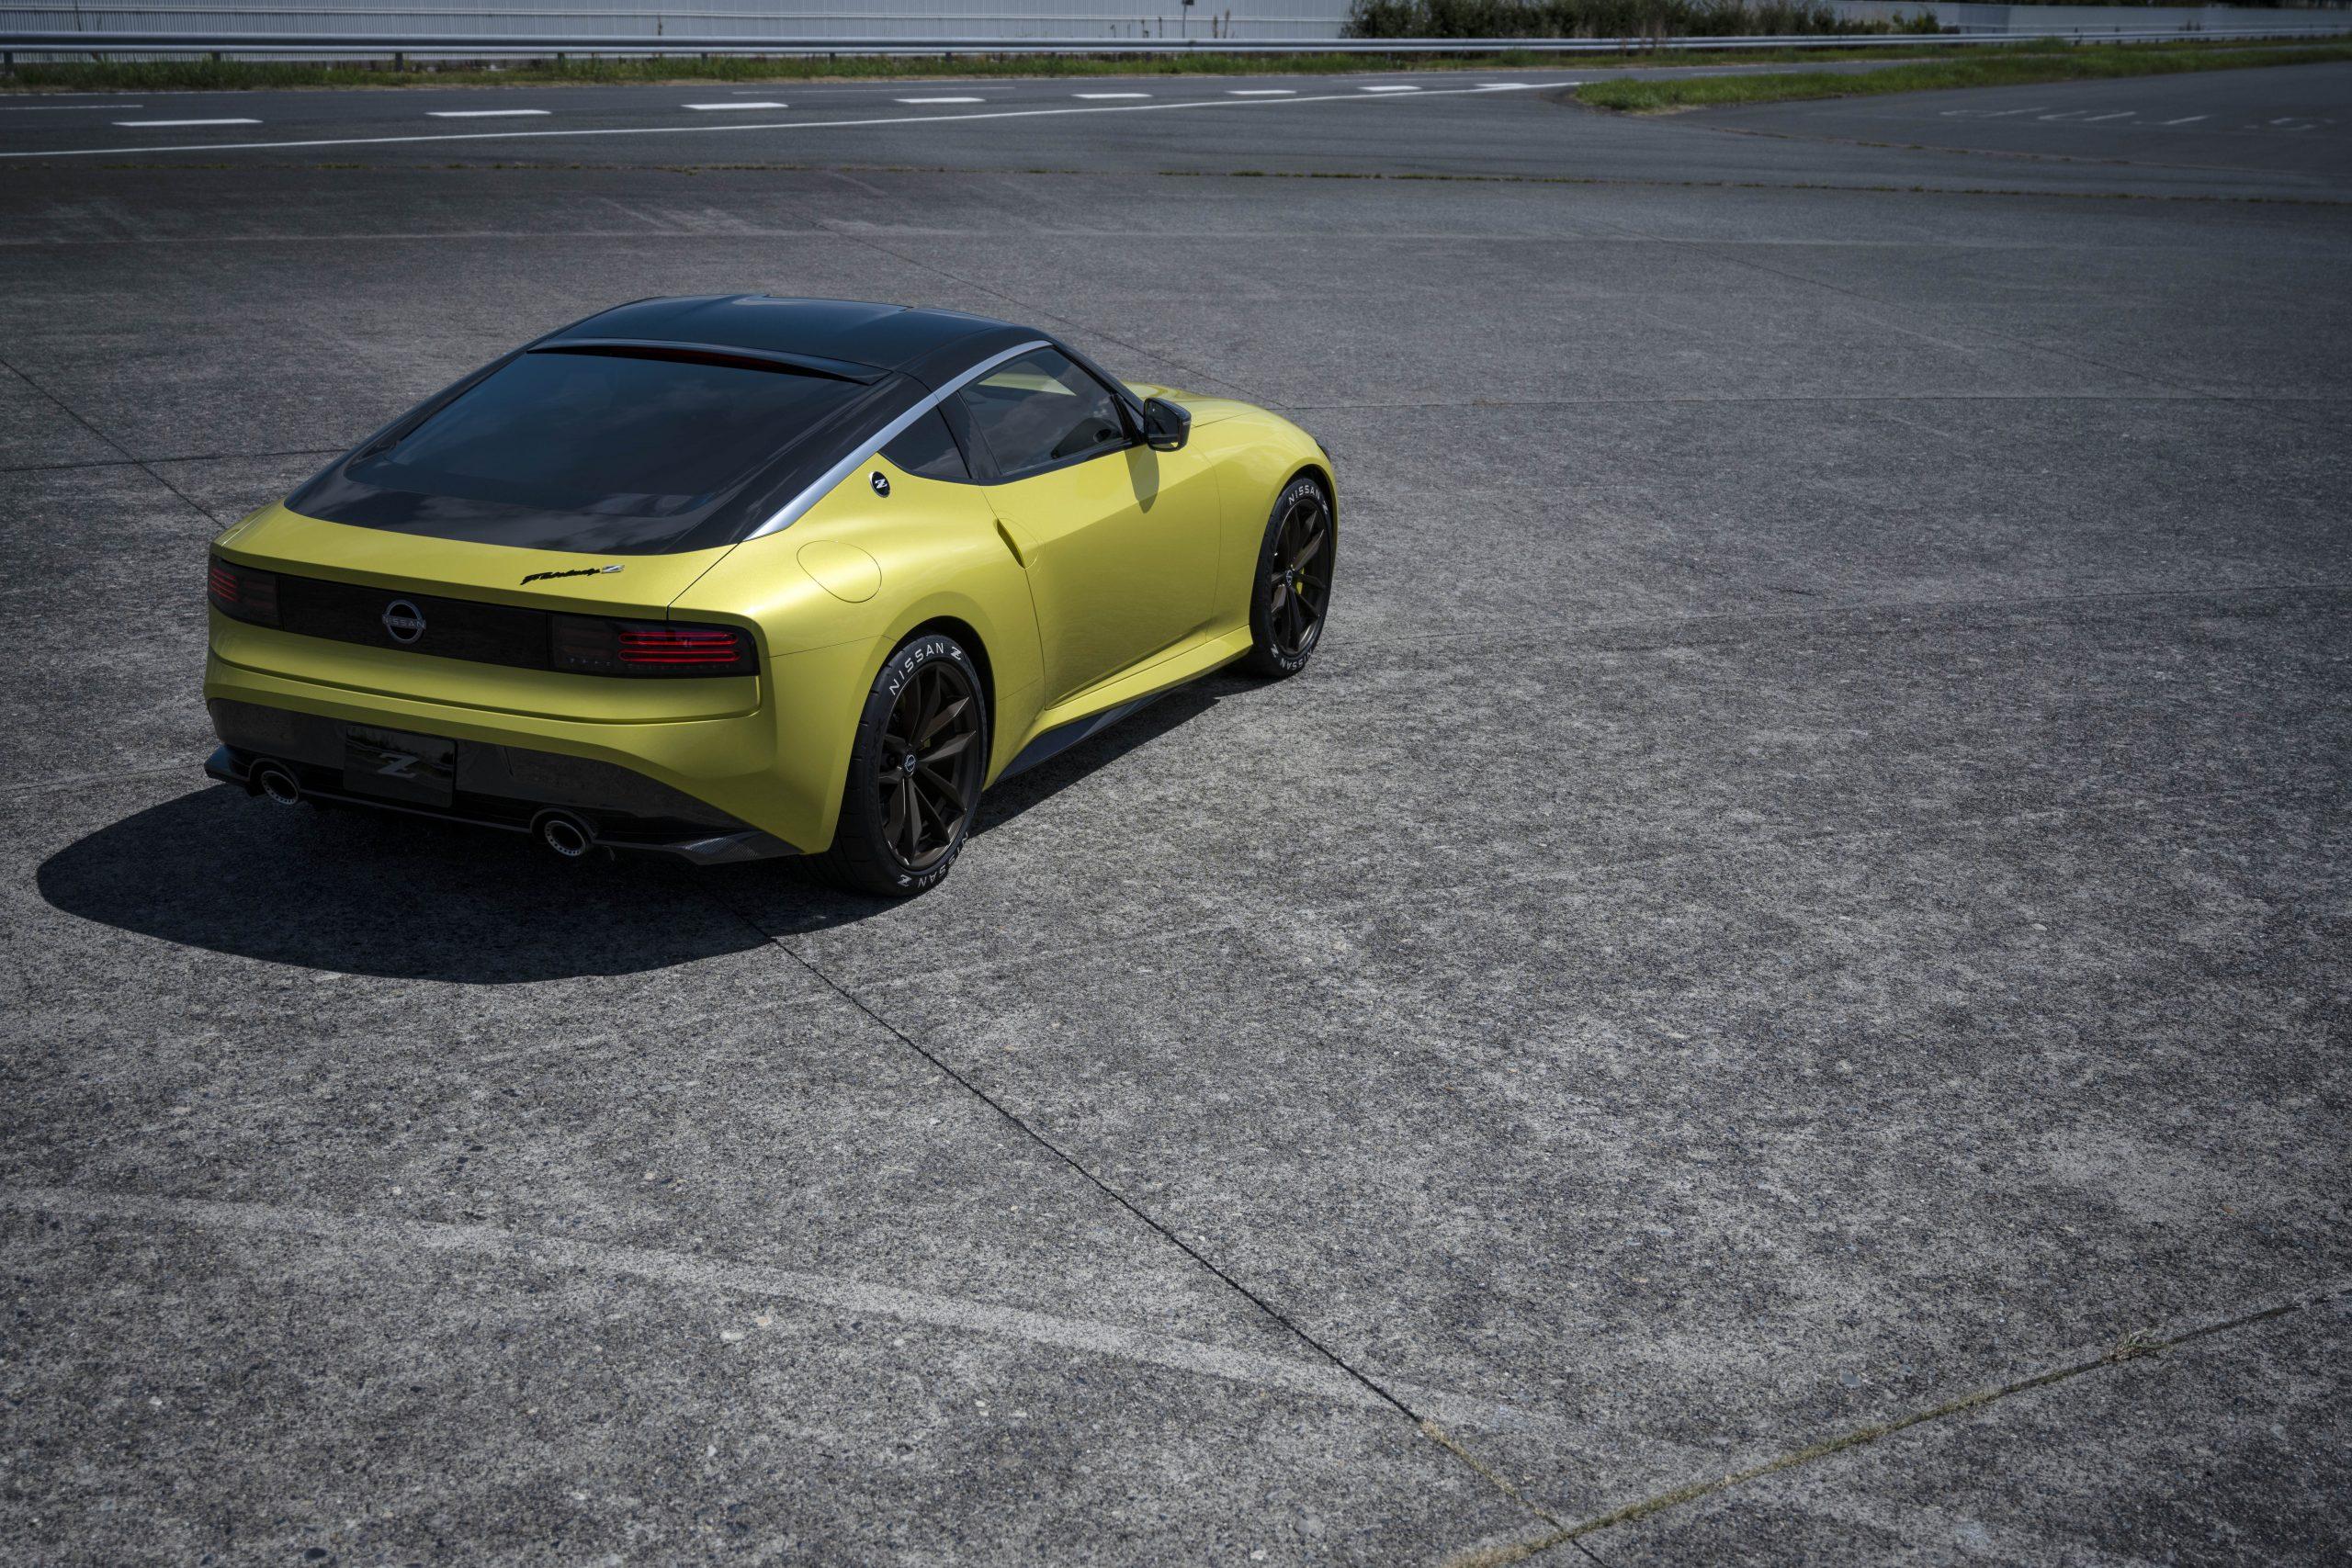 nissan new z car prototype rear three-quarter